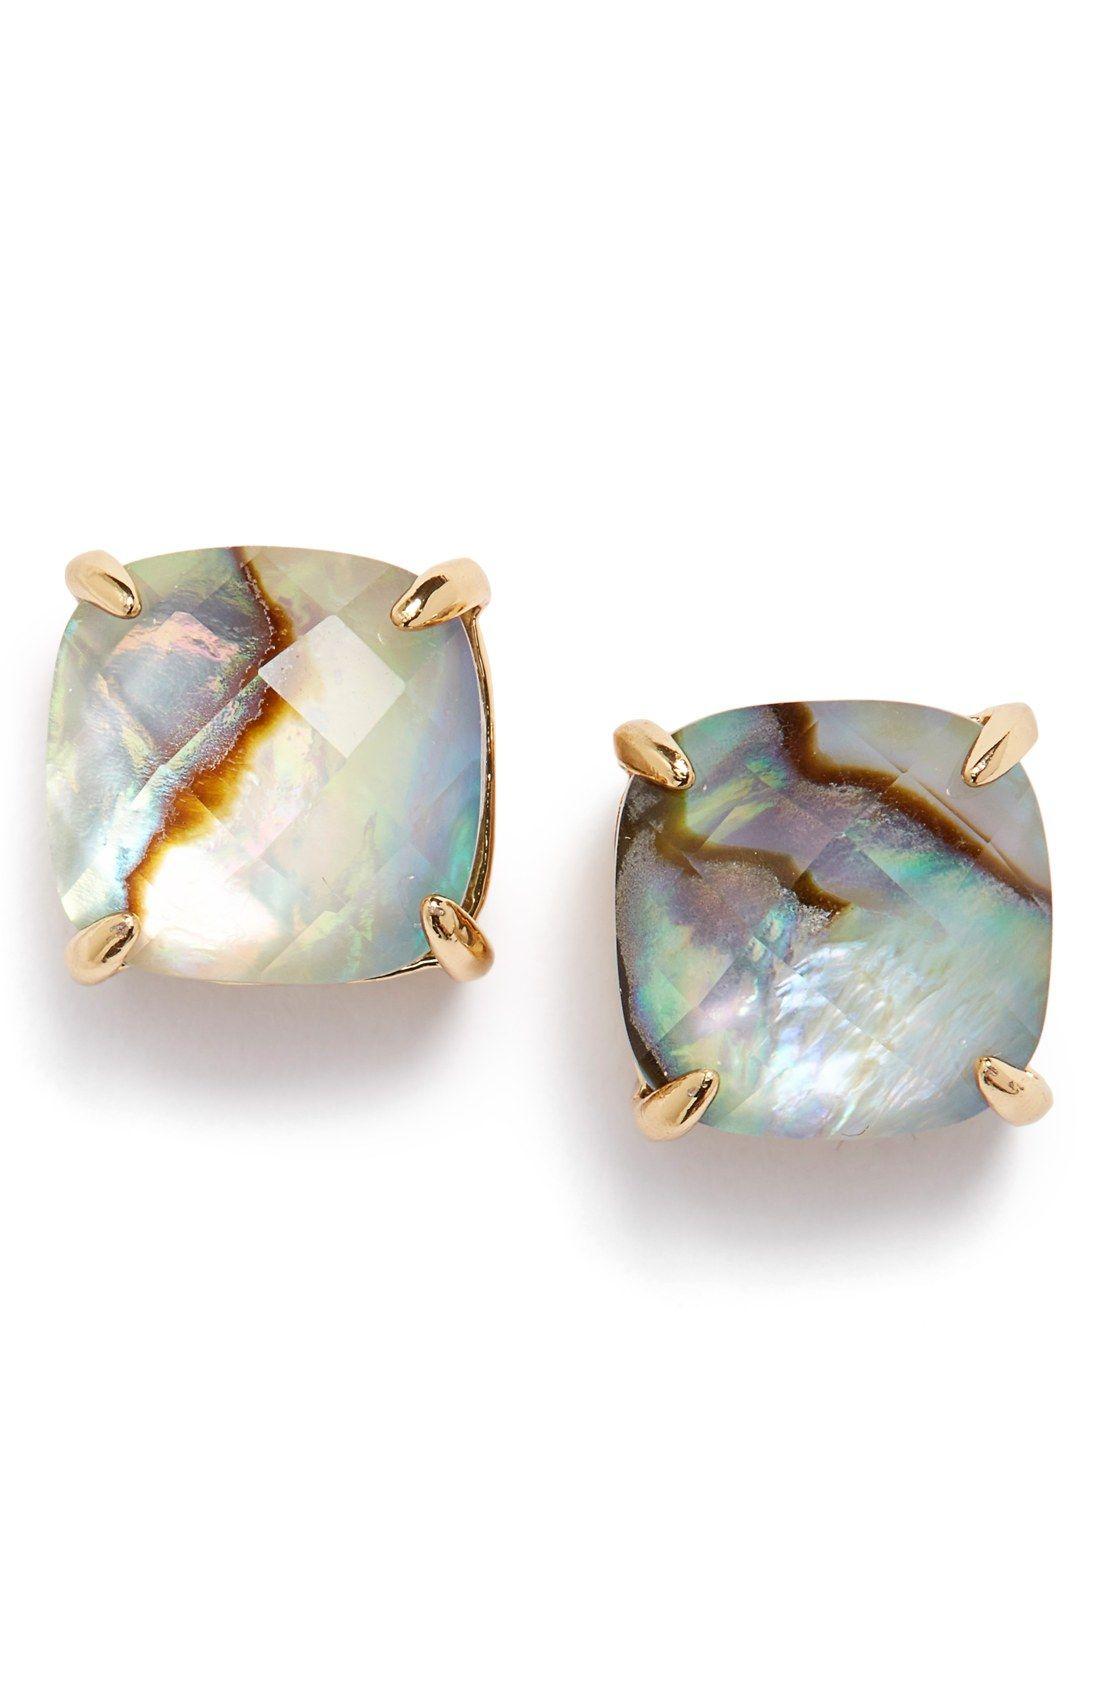 1586cb2d9 kate spade new york mini small square semiprecious stone stud earrings |  Nordstrom